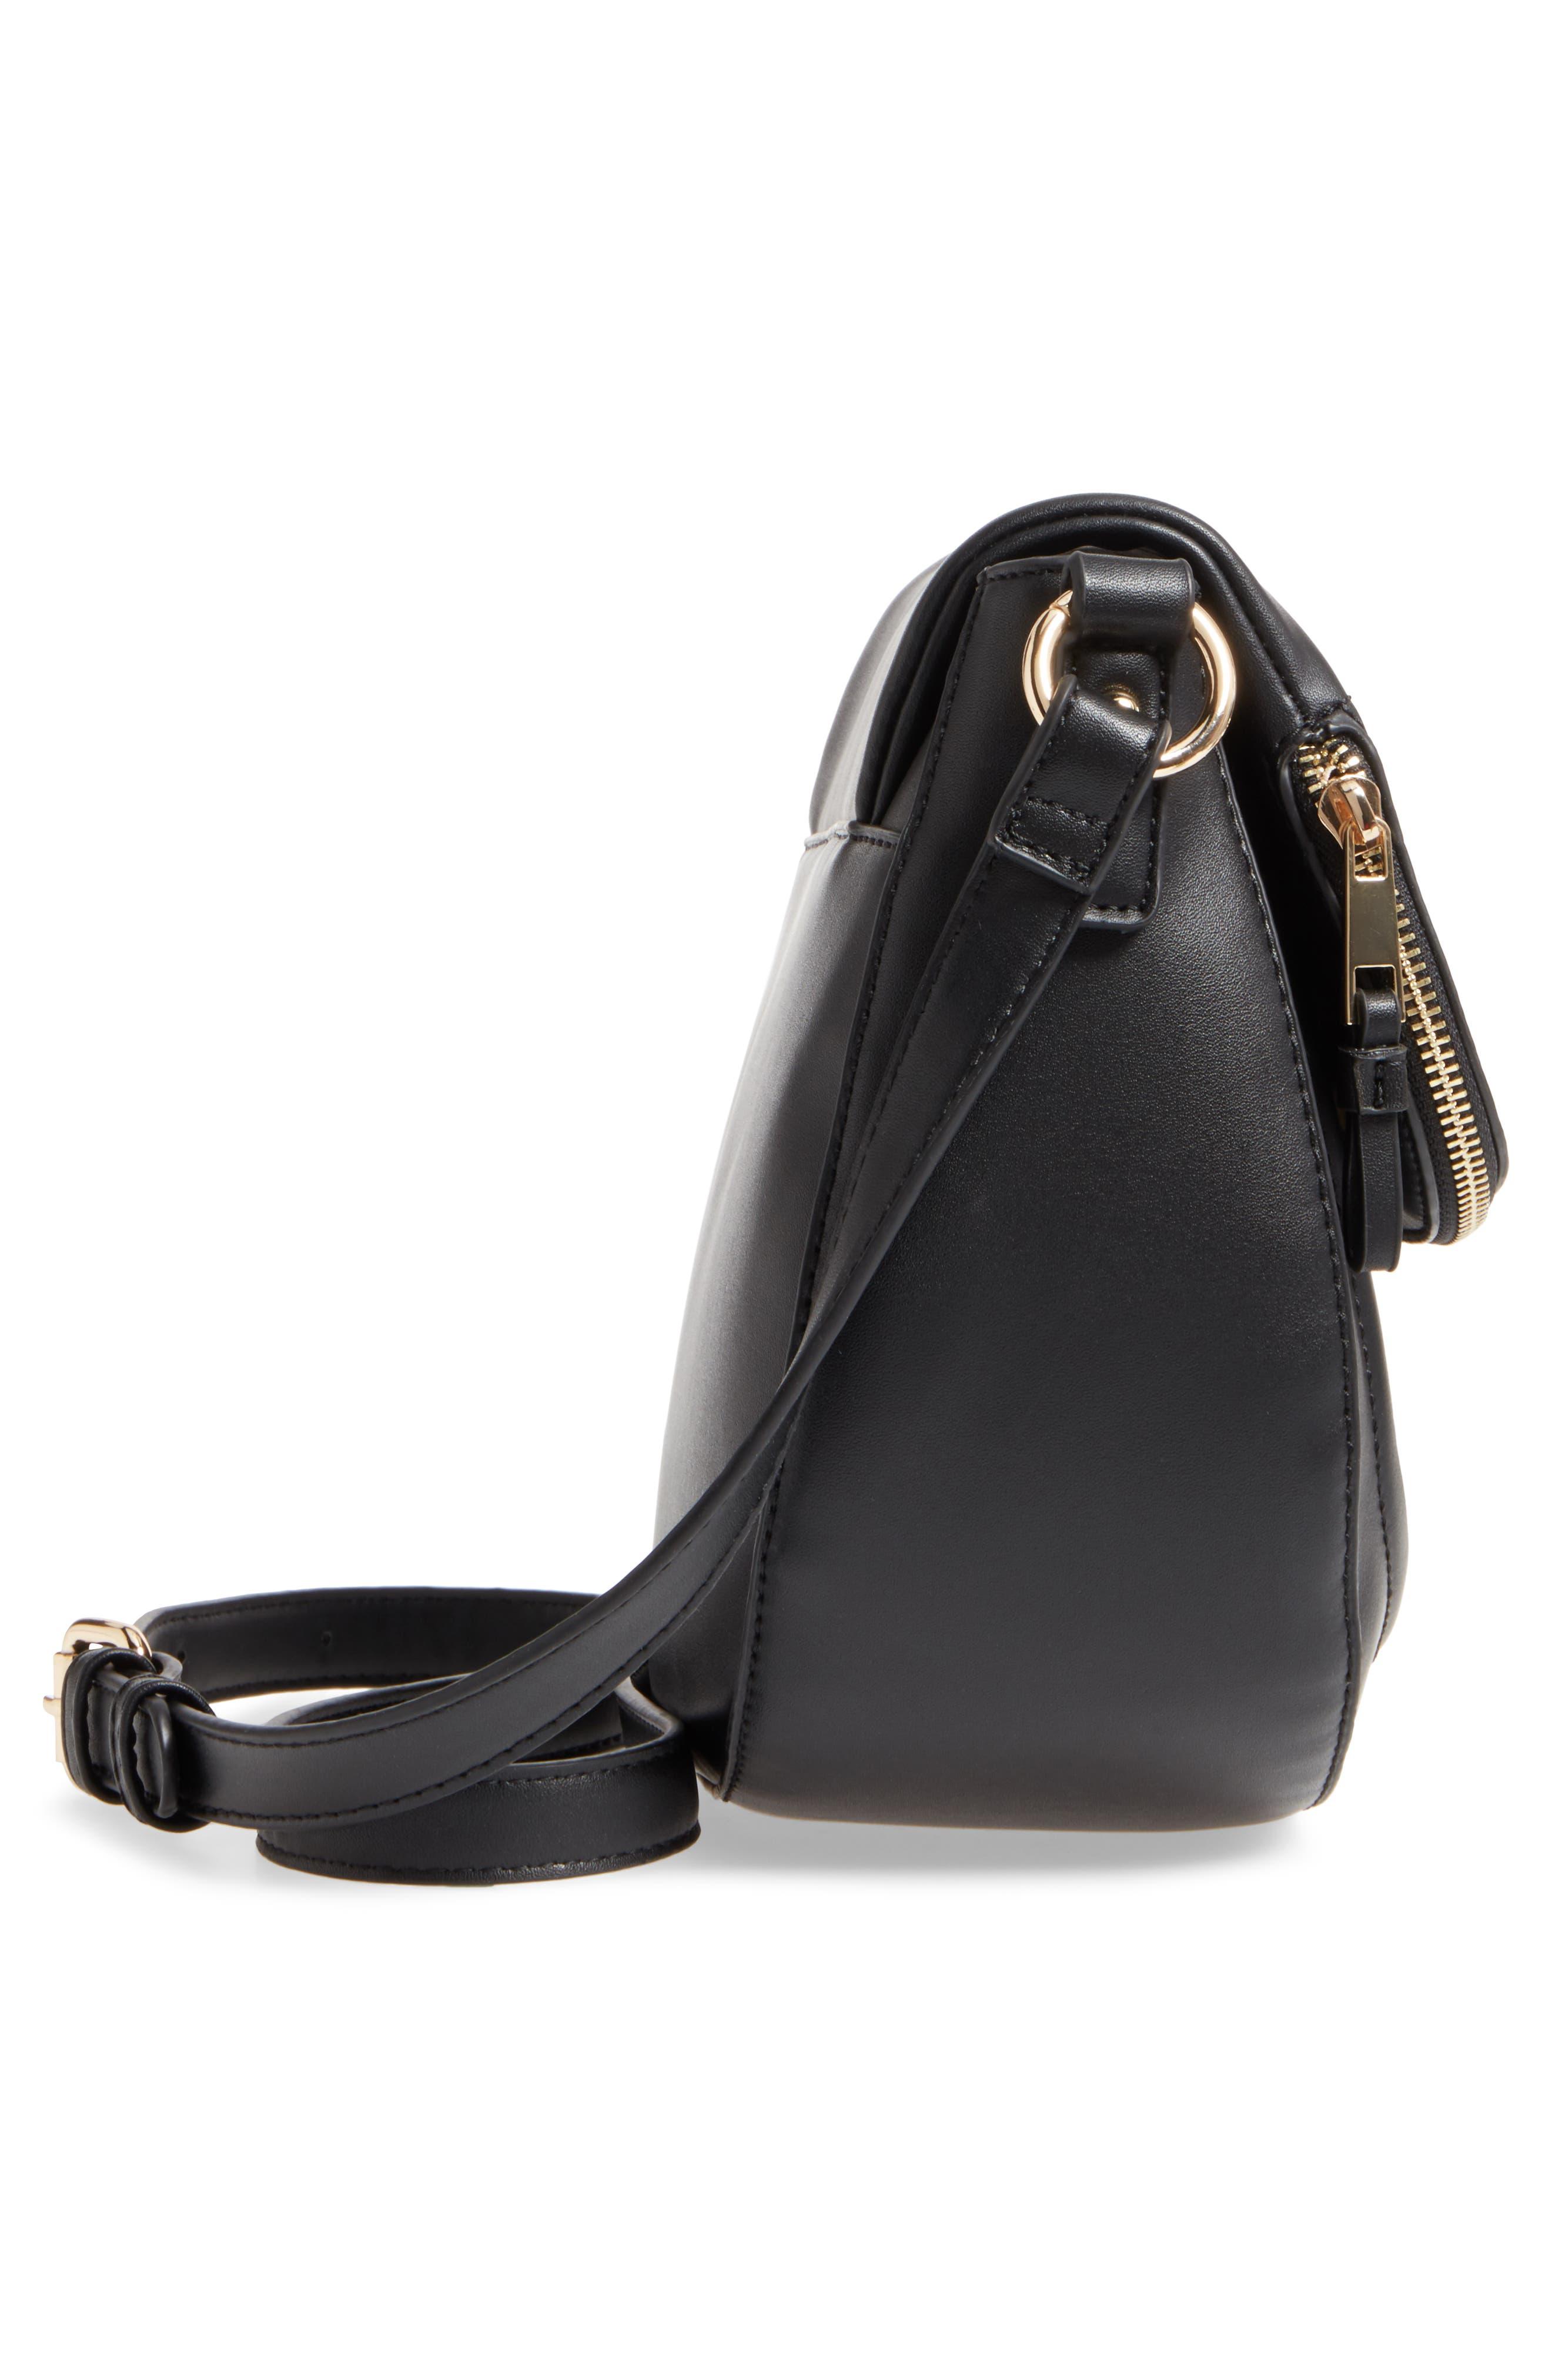 Adden Faux Leather Crossbody Bag,                             Alternate thumbnail 5, color,                             Black